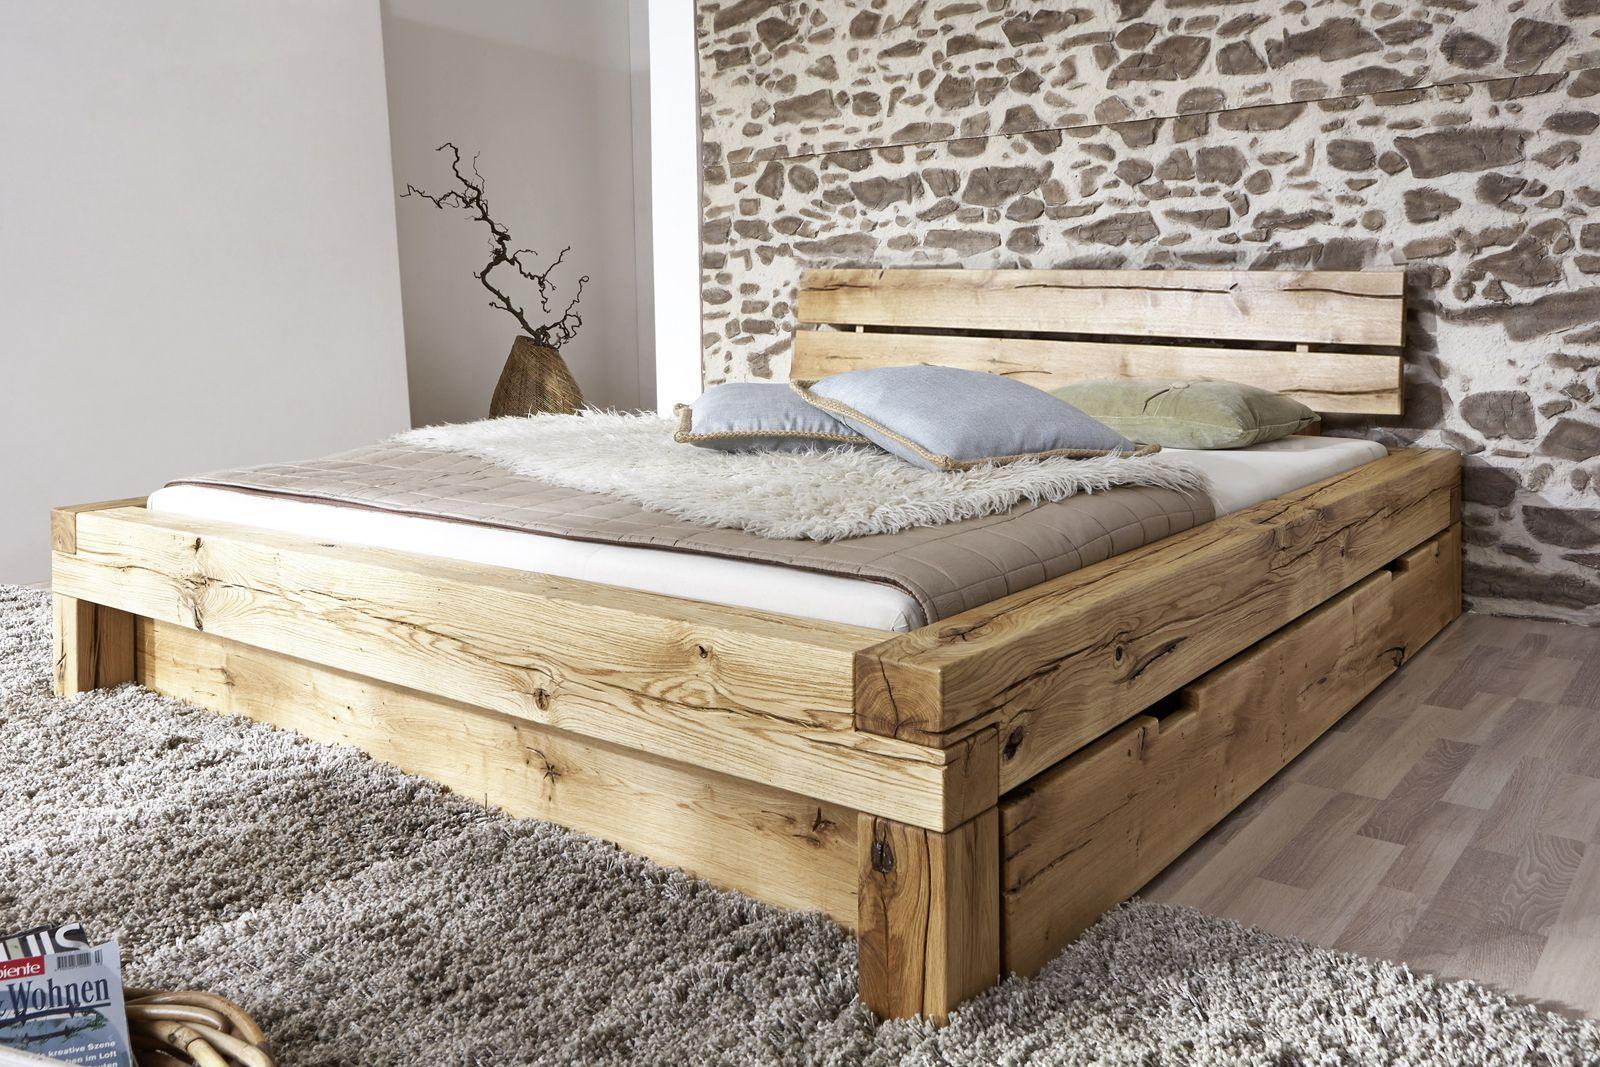 SAM® Balkenbett 160x200 Massivholzbett mit Bettkasten